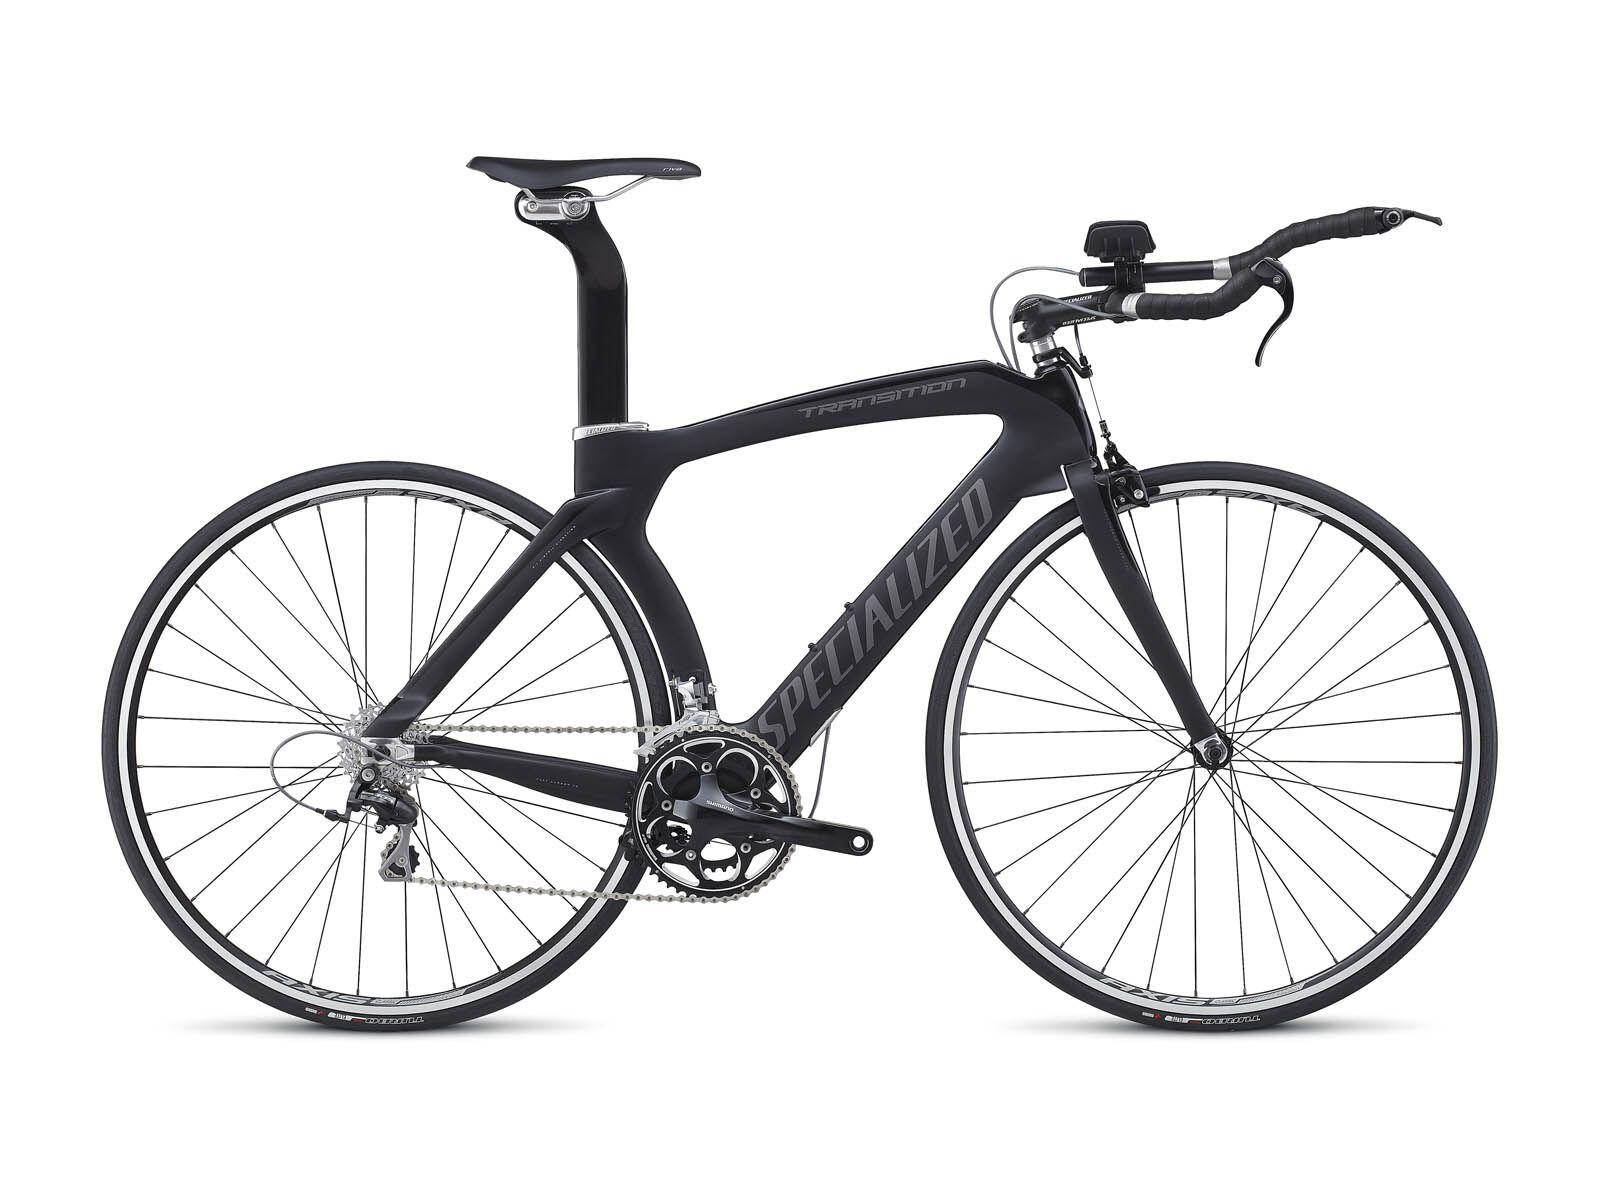 Specialized Transition Sport 105 C2, Carbon/Charcoal   Bild 1